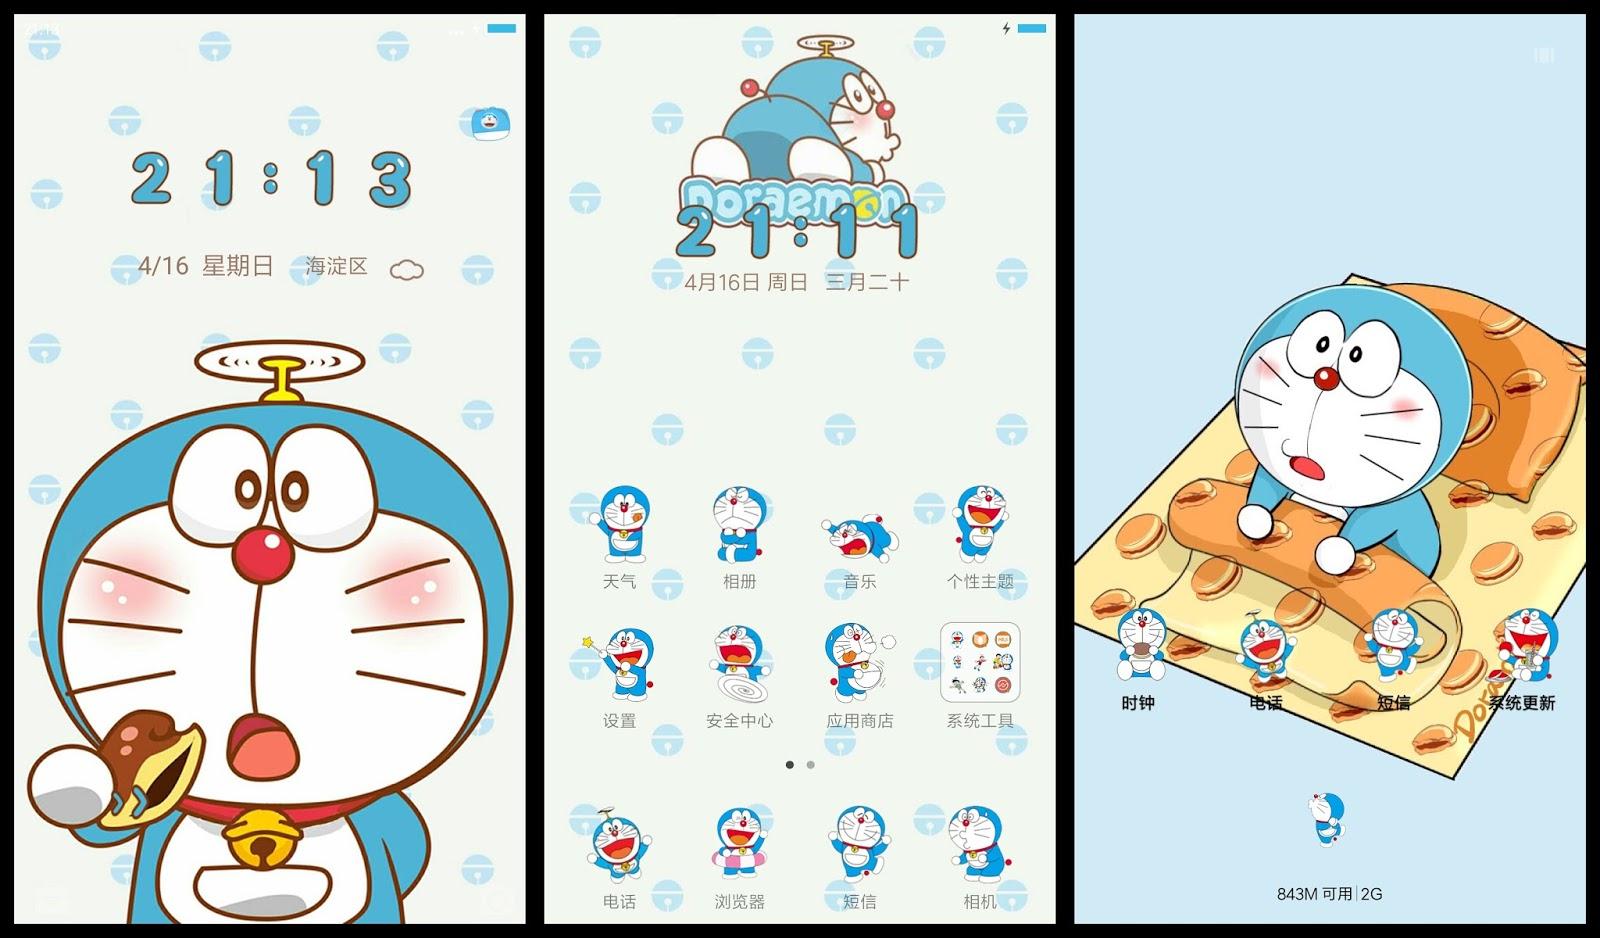 Doraemon 2374058 Hd Wallpaper Backgrounds Download